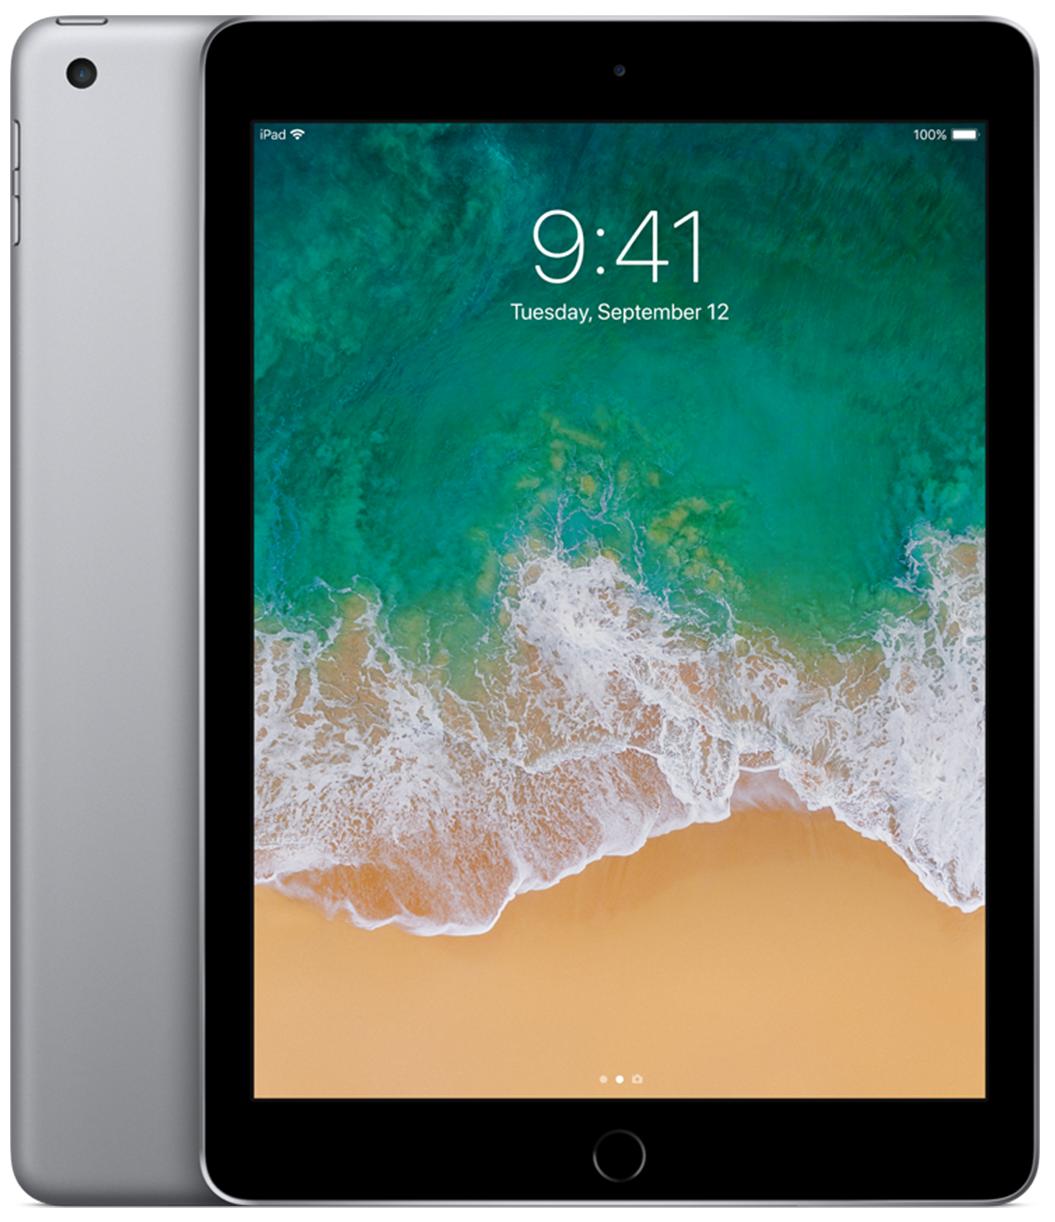 Apple iPad 5 (2017) - 32GB - Space Gray - B+ Grade Tweedehands